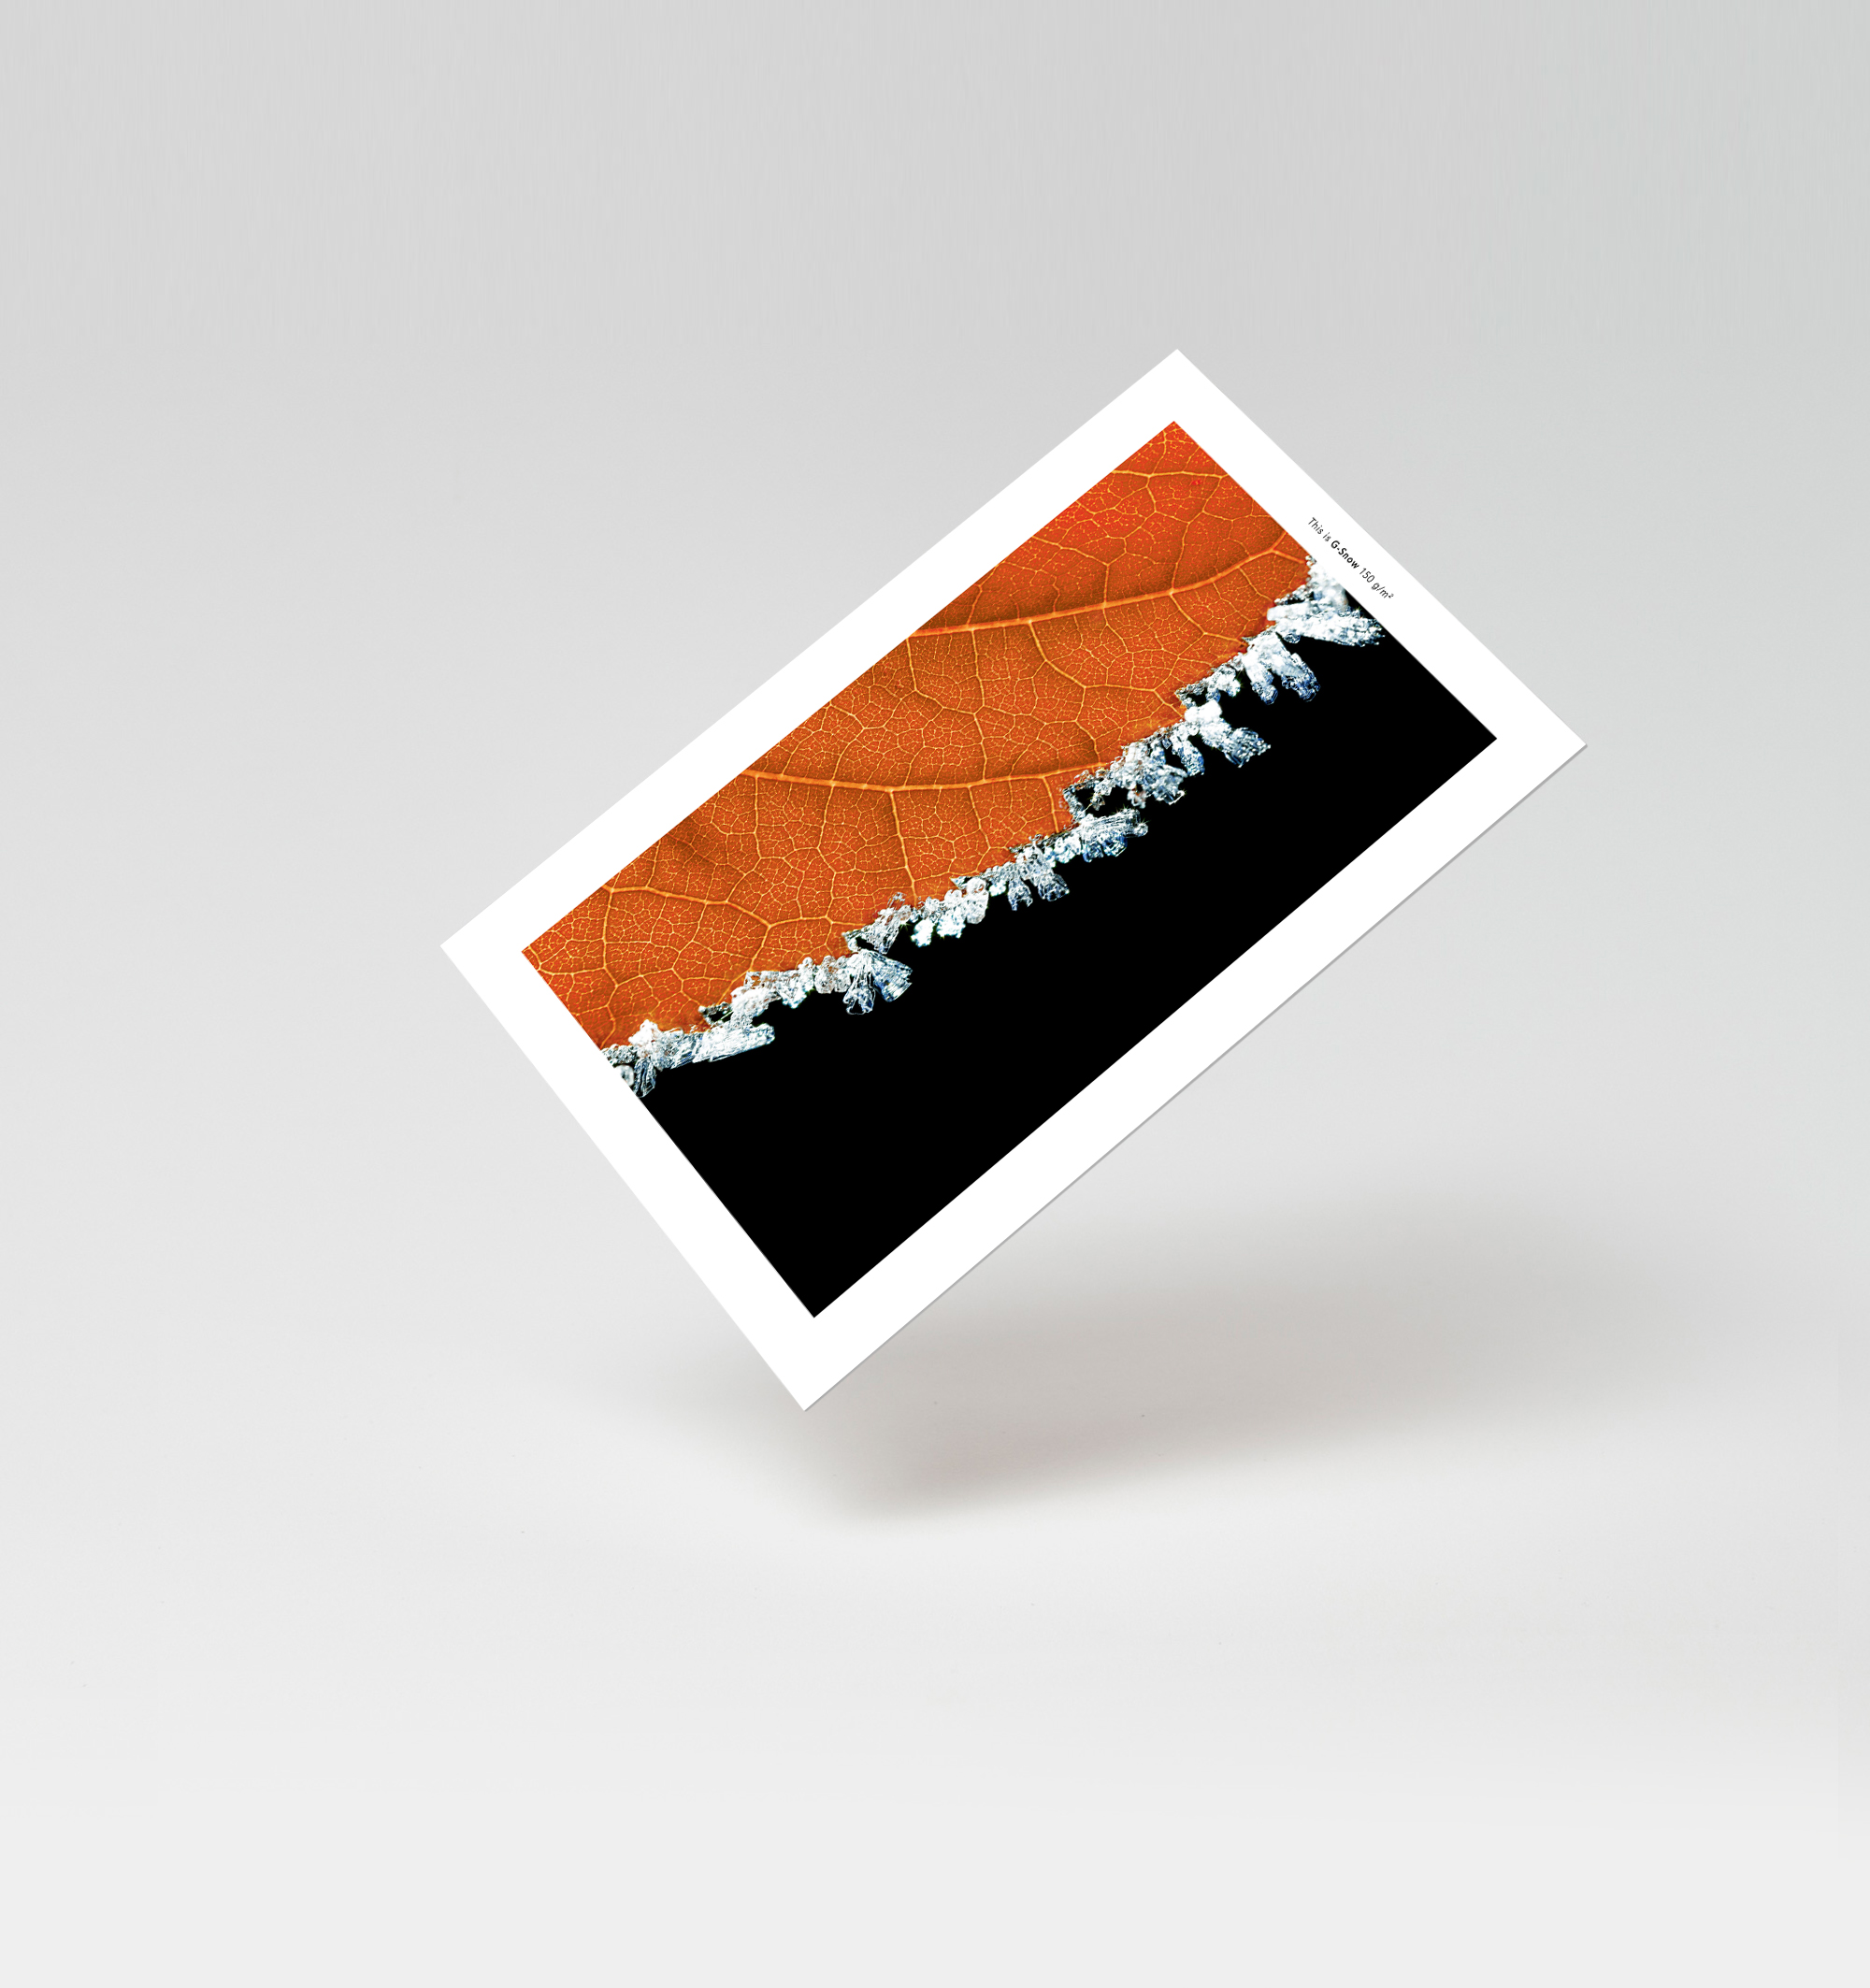 Icke gamla Arctic Paper lanserar ett ultravitt papper | PAPPERochMASSA.se RO-21